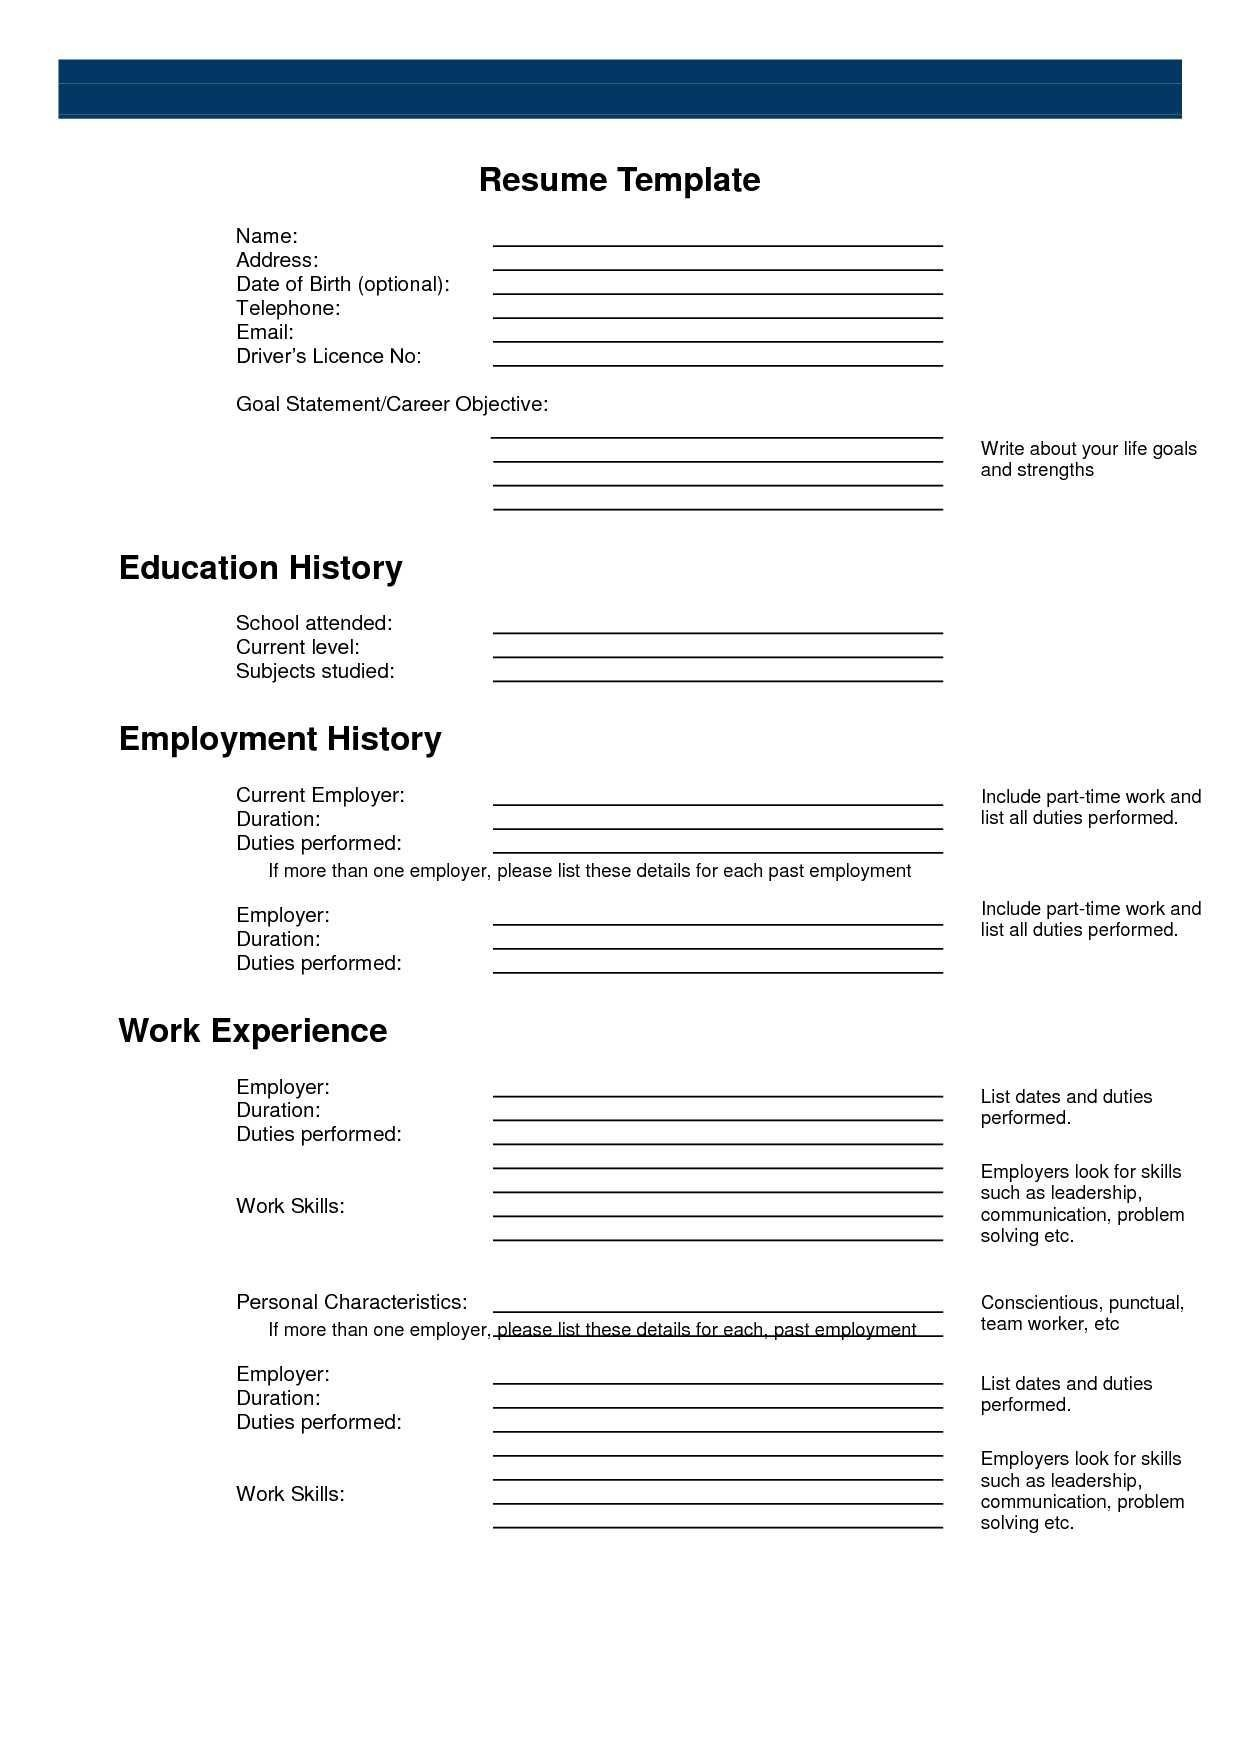 Pinanishfeds On Resumes | Free Printable Resume, Free Printable - Free Printable Professional Resume Templates